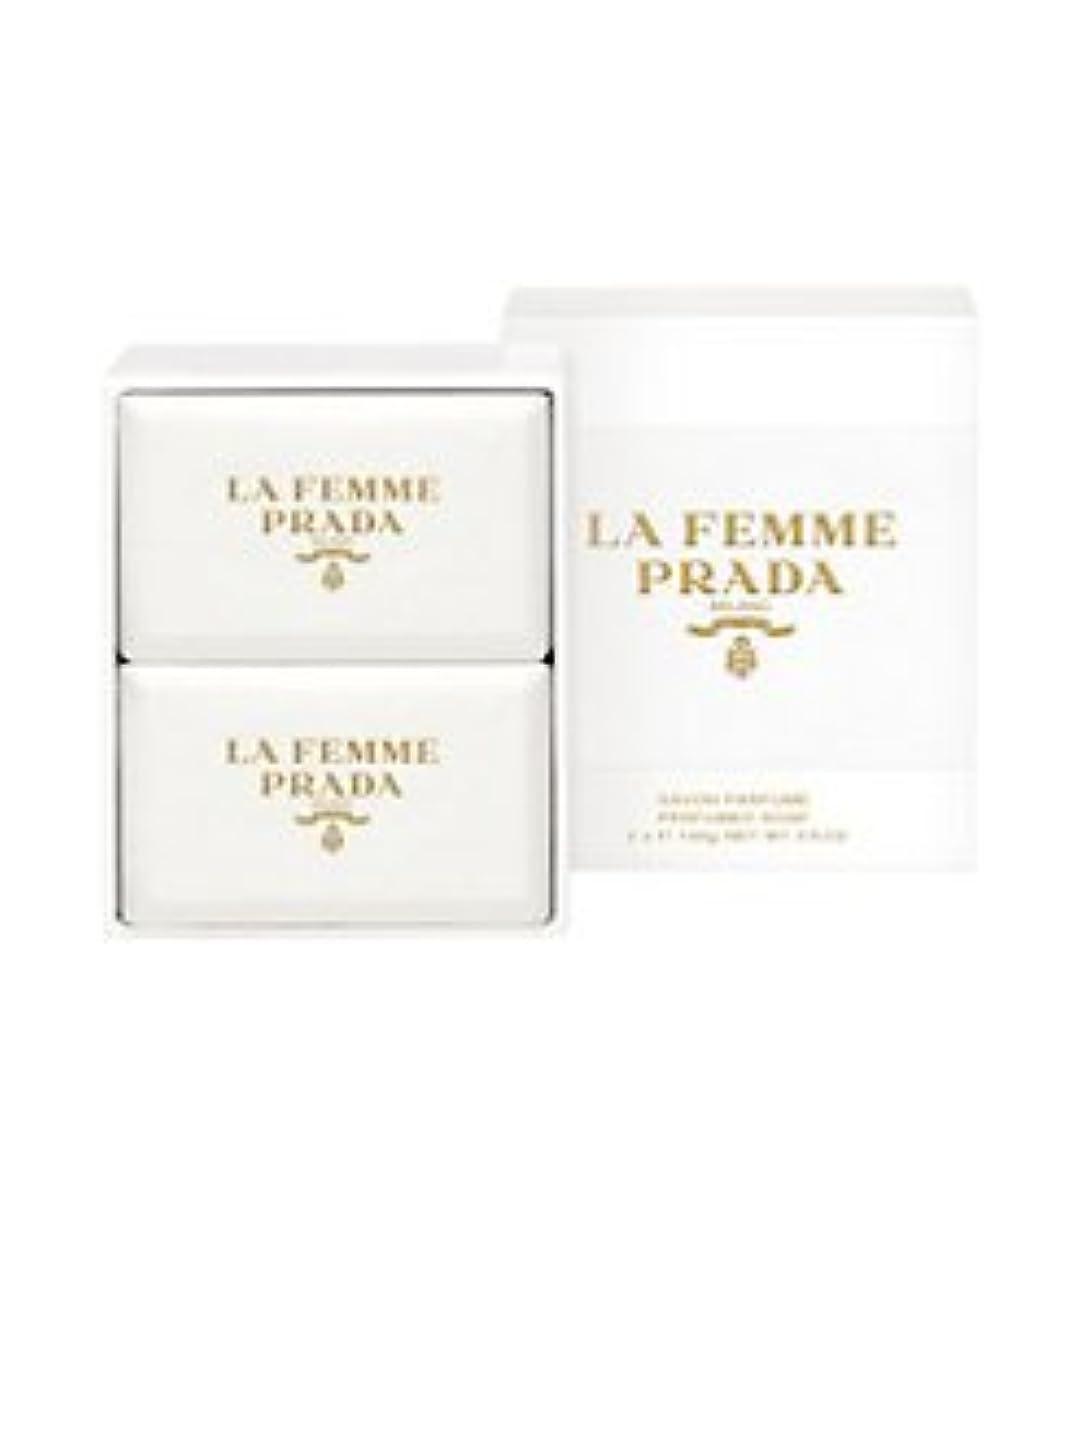 La Femme Prada (ラ フェム プラダ) 1.75 oz (52ml) Soap (石鹸) x 2個 for Women